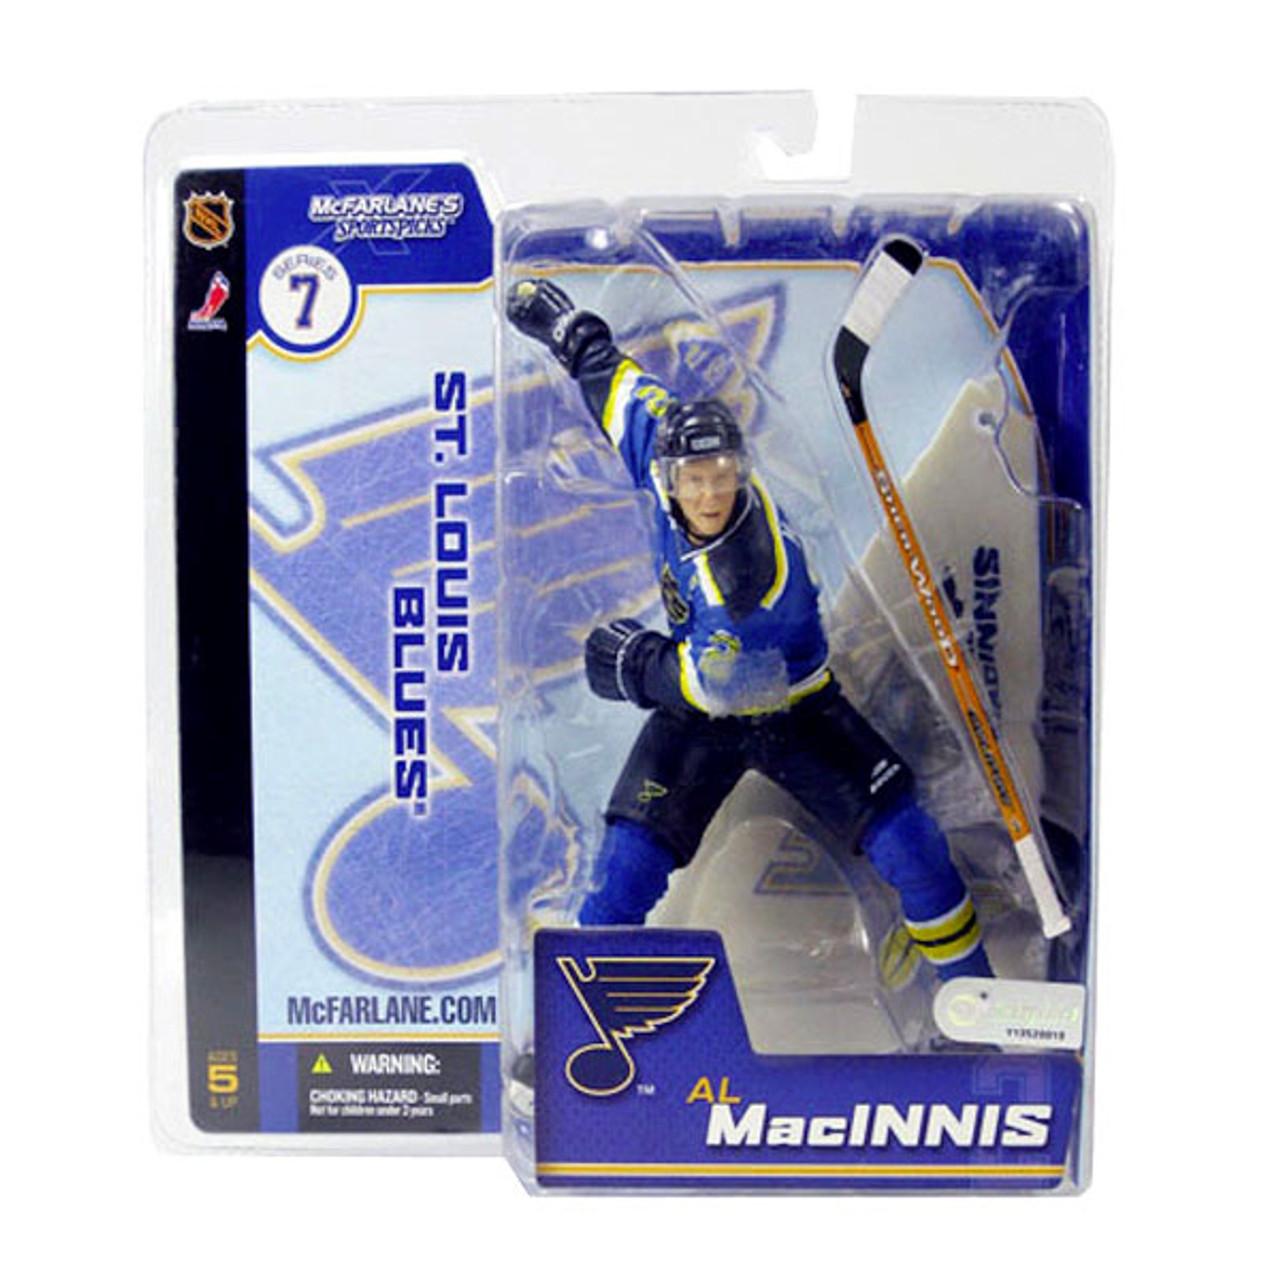 McFarlane Toys NHL St. Louis Blues Sports Picks Series 7 Al Macinnis Action Figure [Blue Jersey]